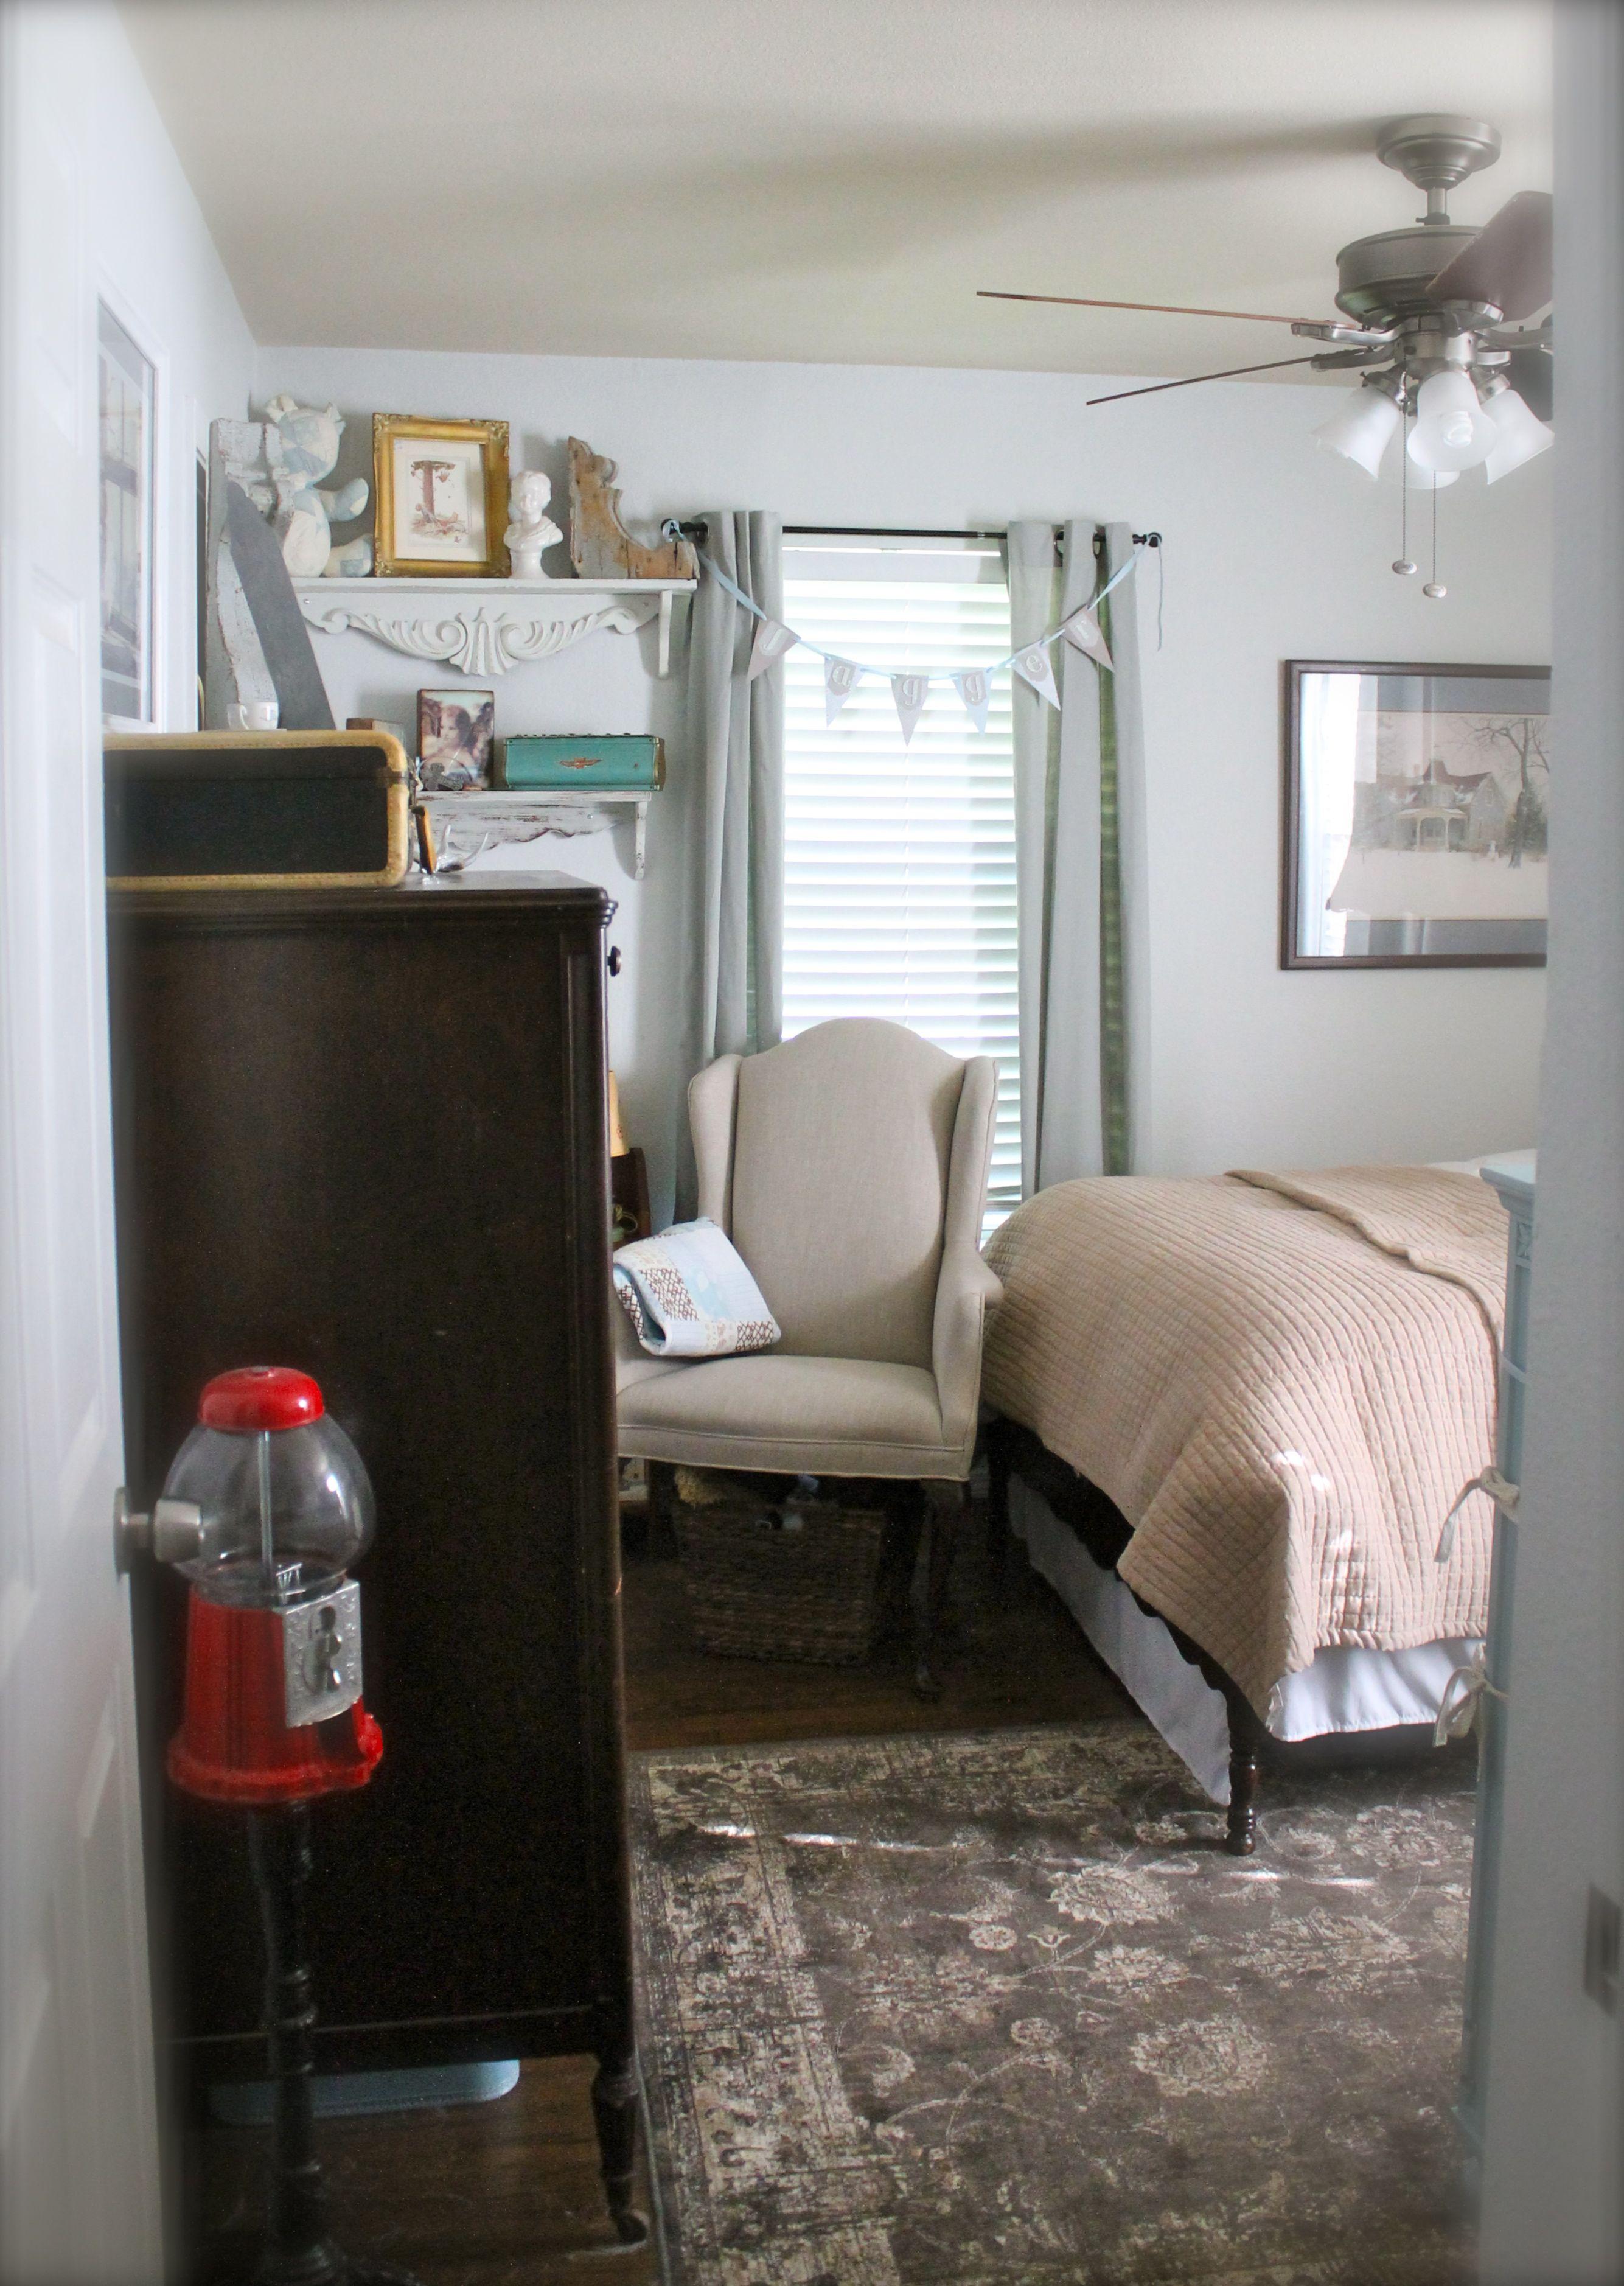 Vintage Boy Room Vintage Nursery Paint Fleur De Sel By Sherwin Williams Rug Tj Maxx Homegoods Boys Room Decor